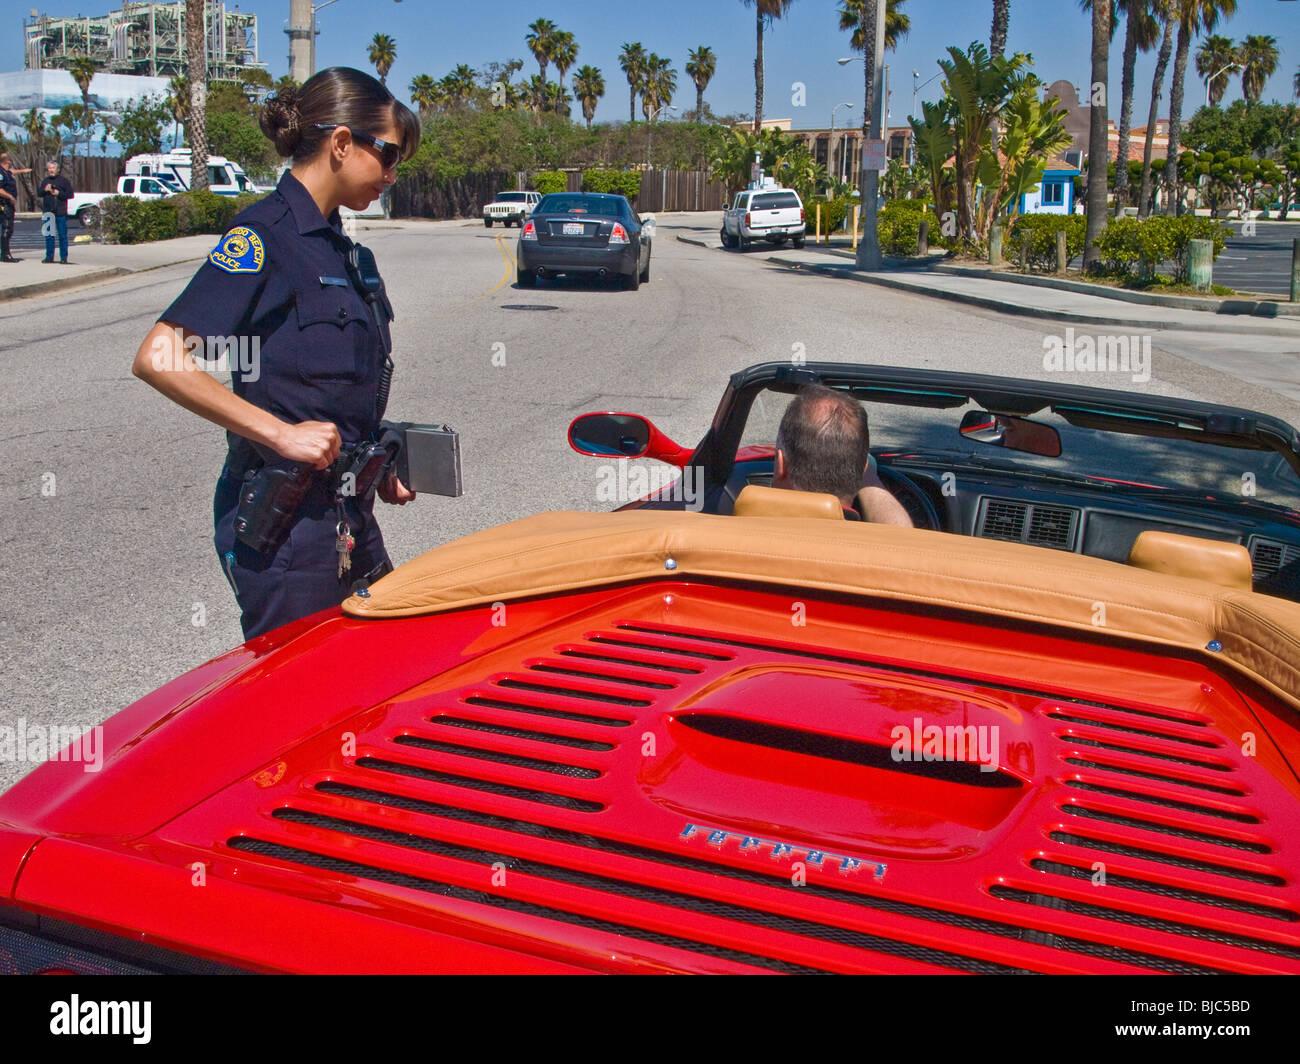 Female police officer at traffic stop, detains male Ferrari driver. - Stock Image